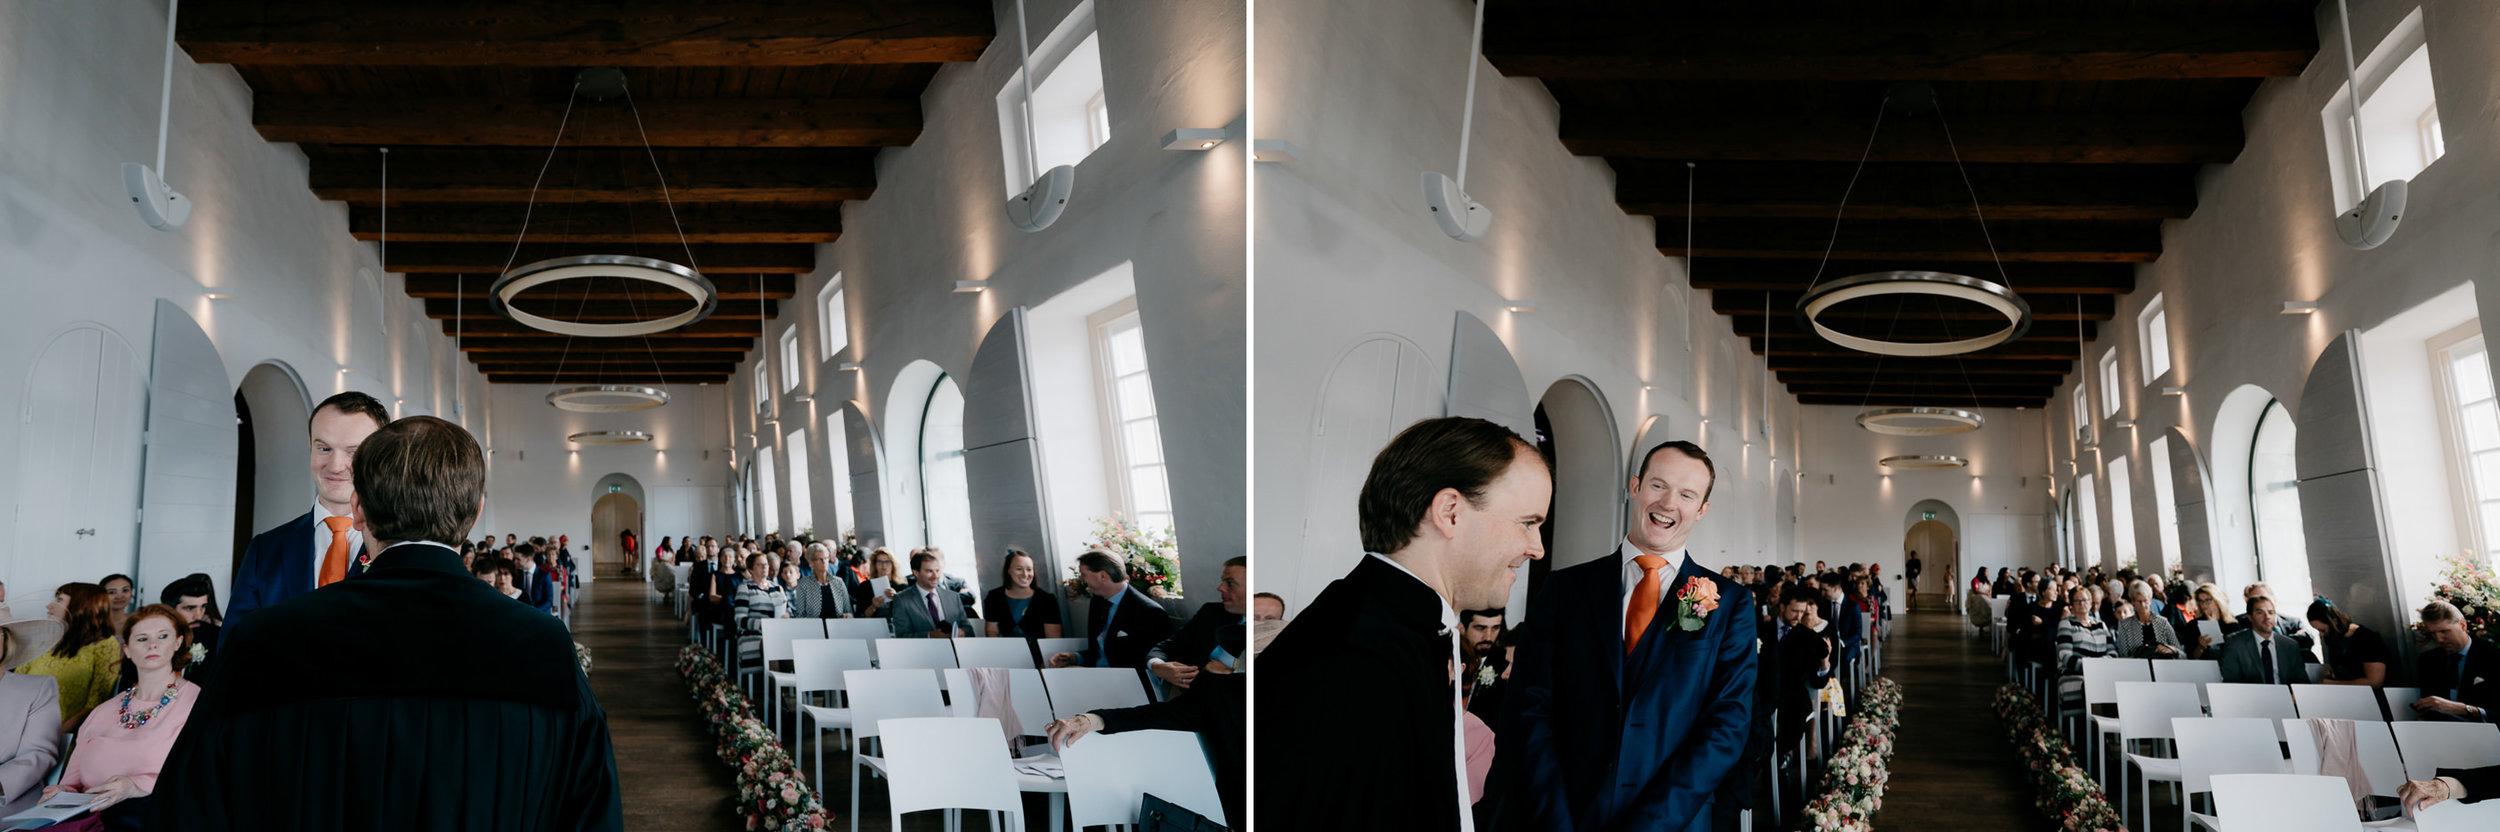 bruidsfotografie-trouwfotograaf-wedding-photographer-amsterdam-James-Jantine-104 copy.jpg